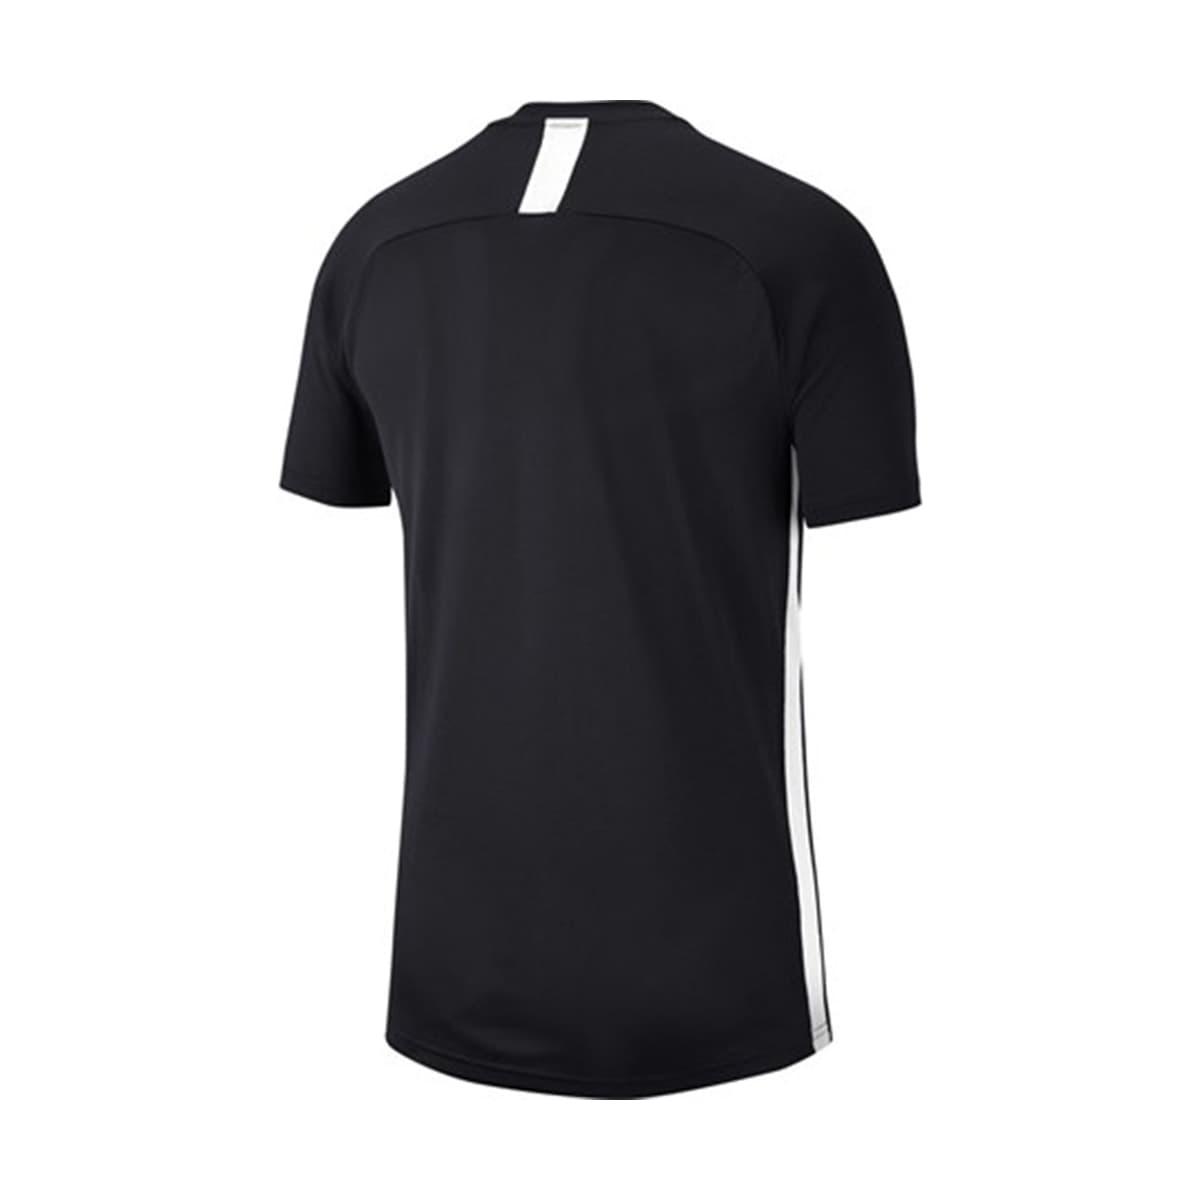 Dri-Fit Academy 19 Erkek Siyah Tişört (AJ9088-010)